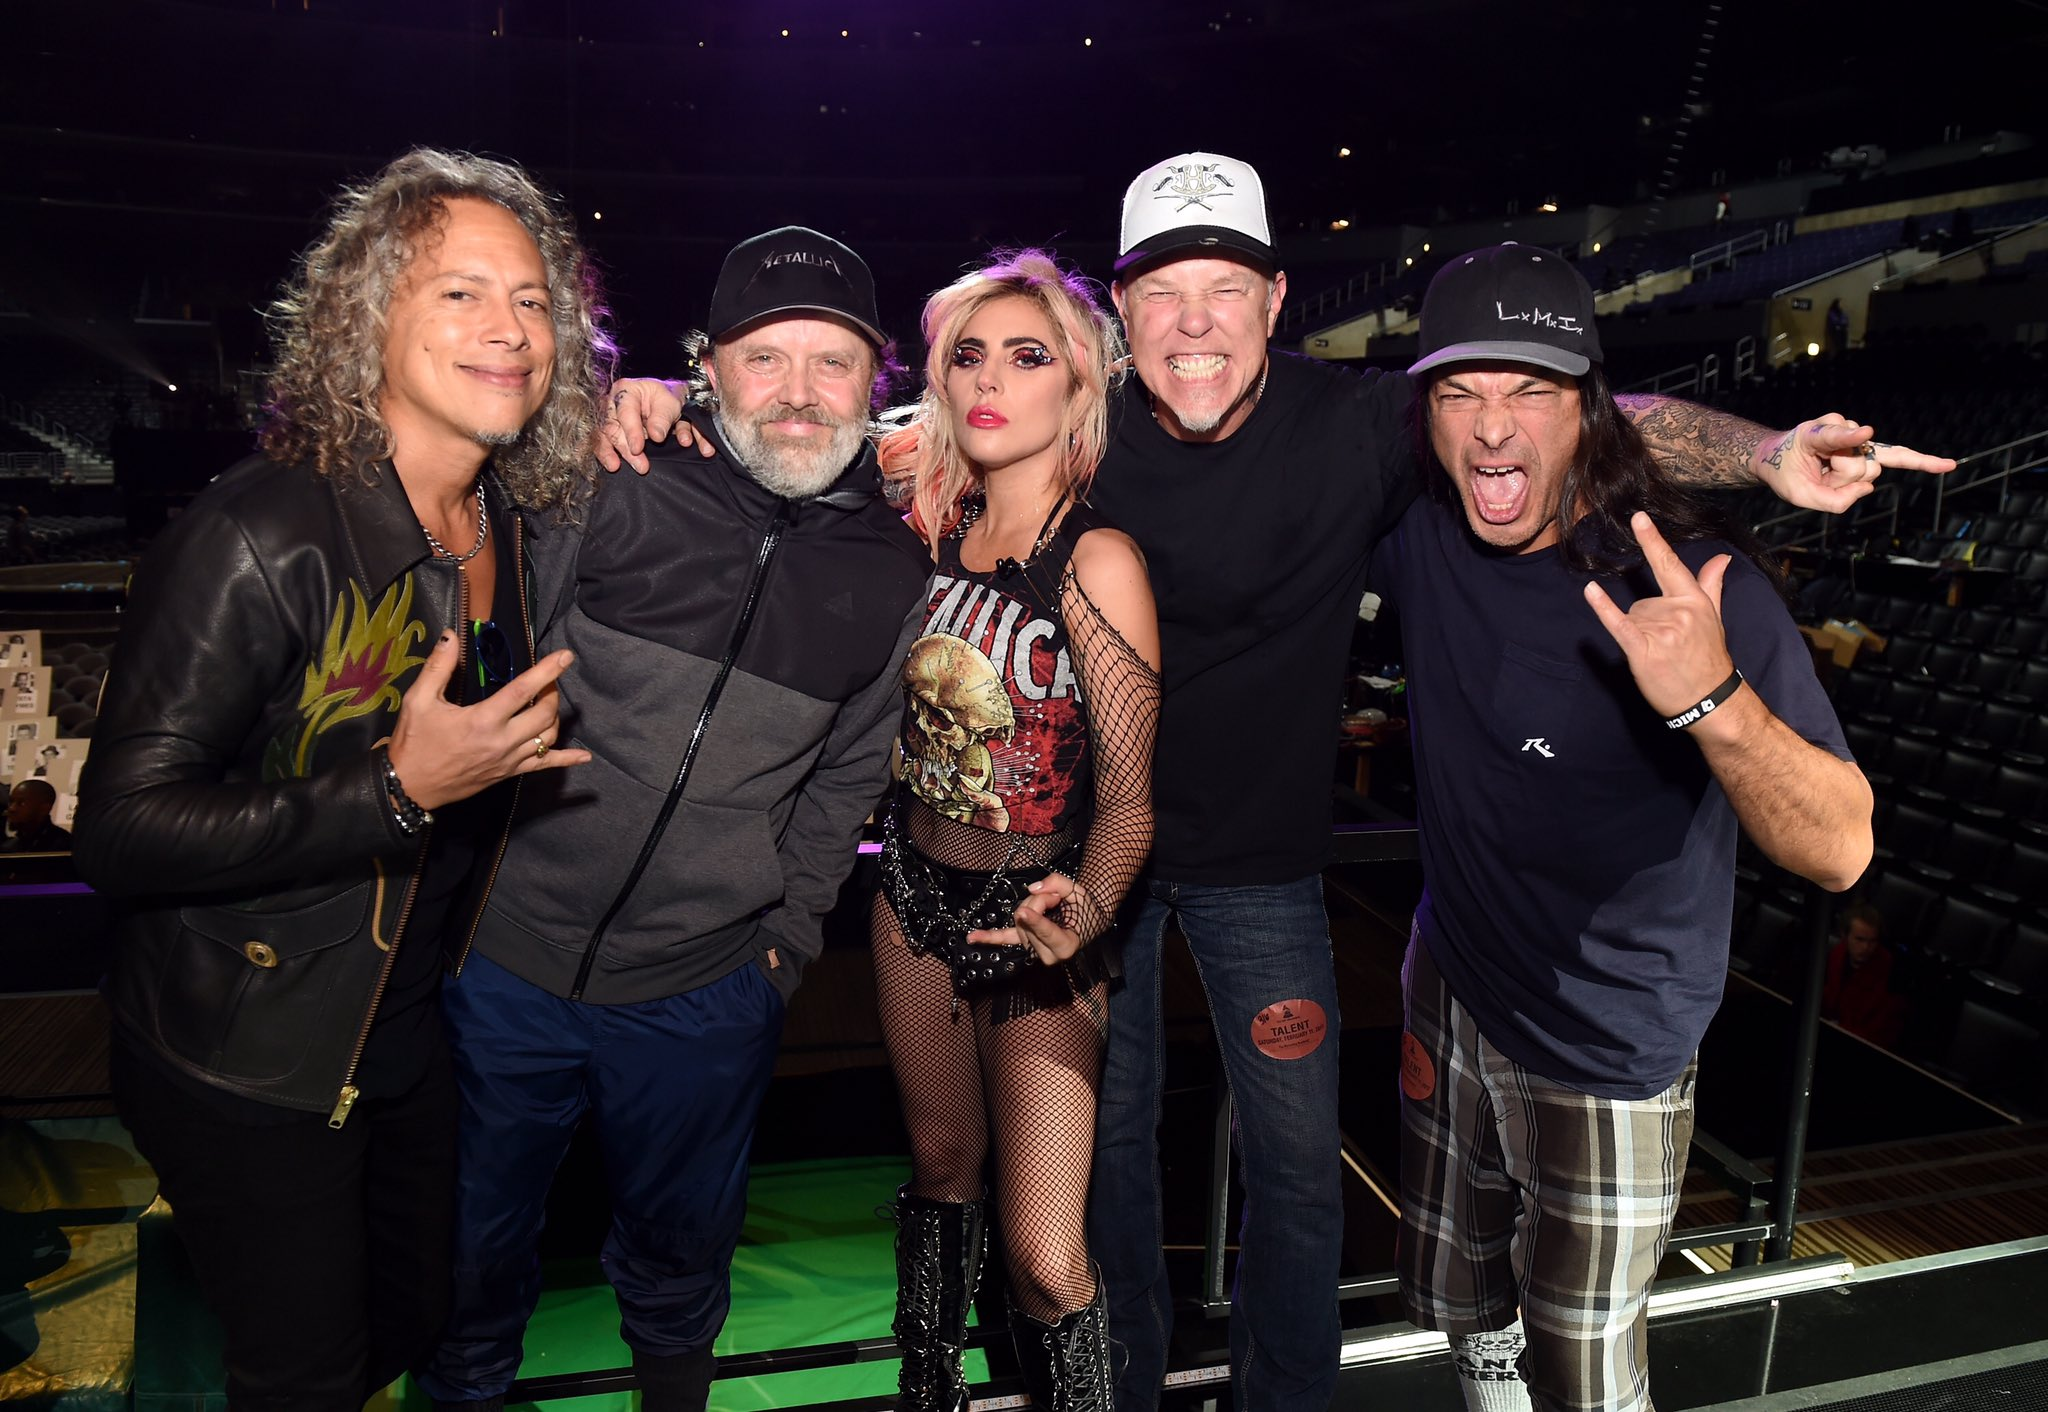 See you at the Grammys. ��#MetalliGa @Metallica ���� https://t.co/asIALPRrPC